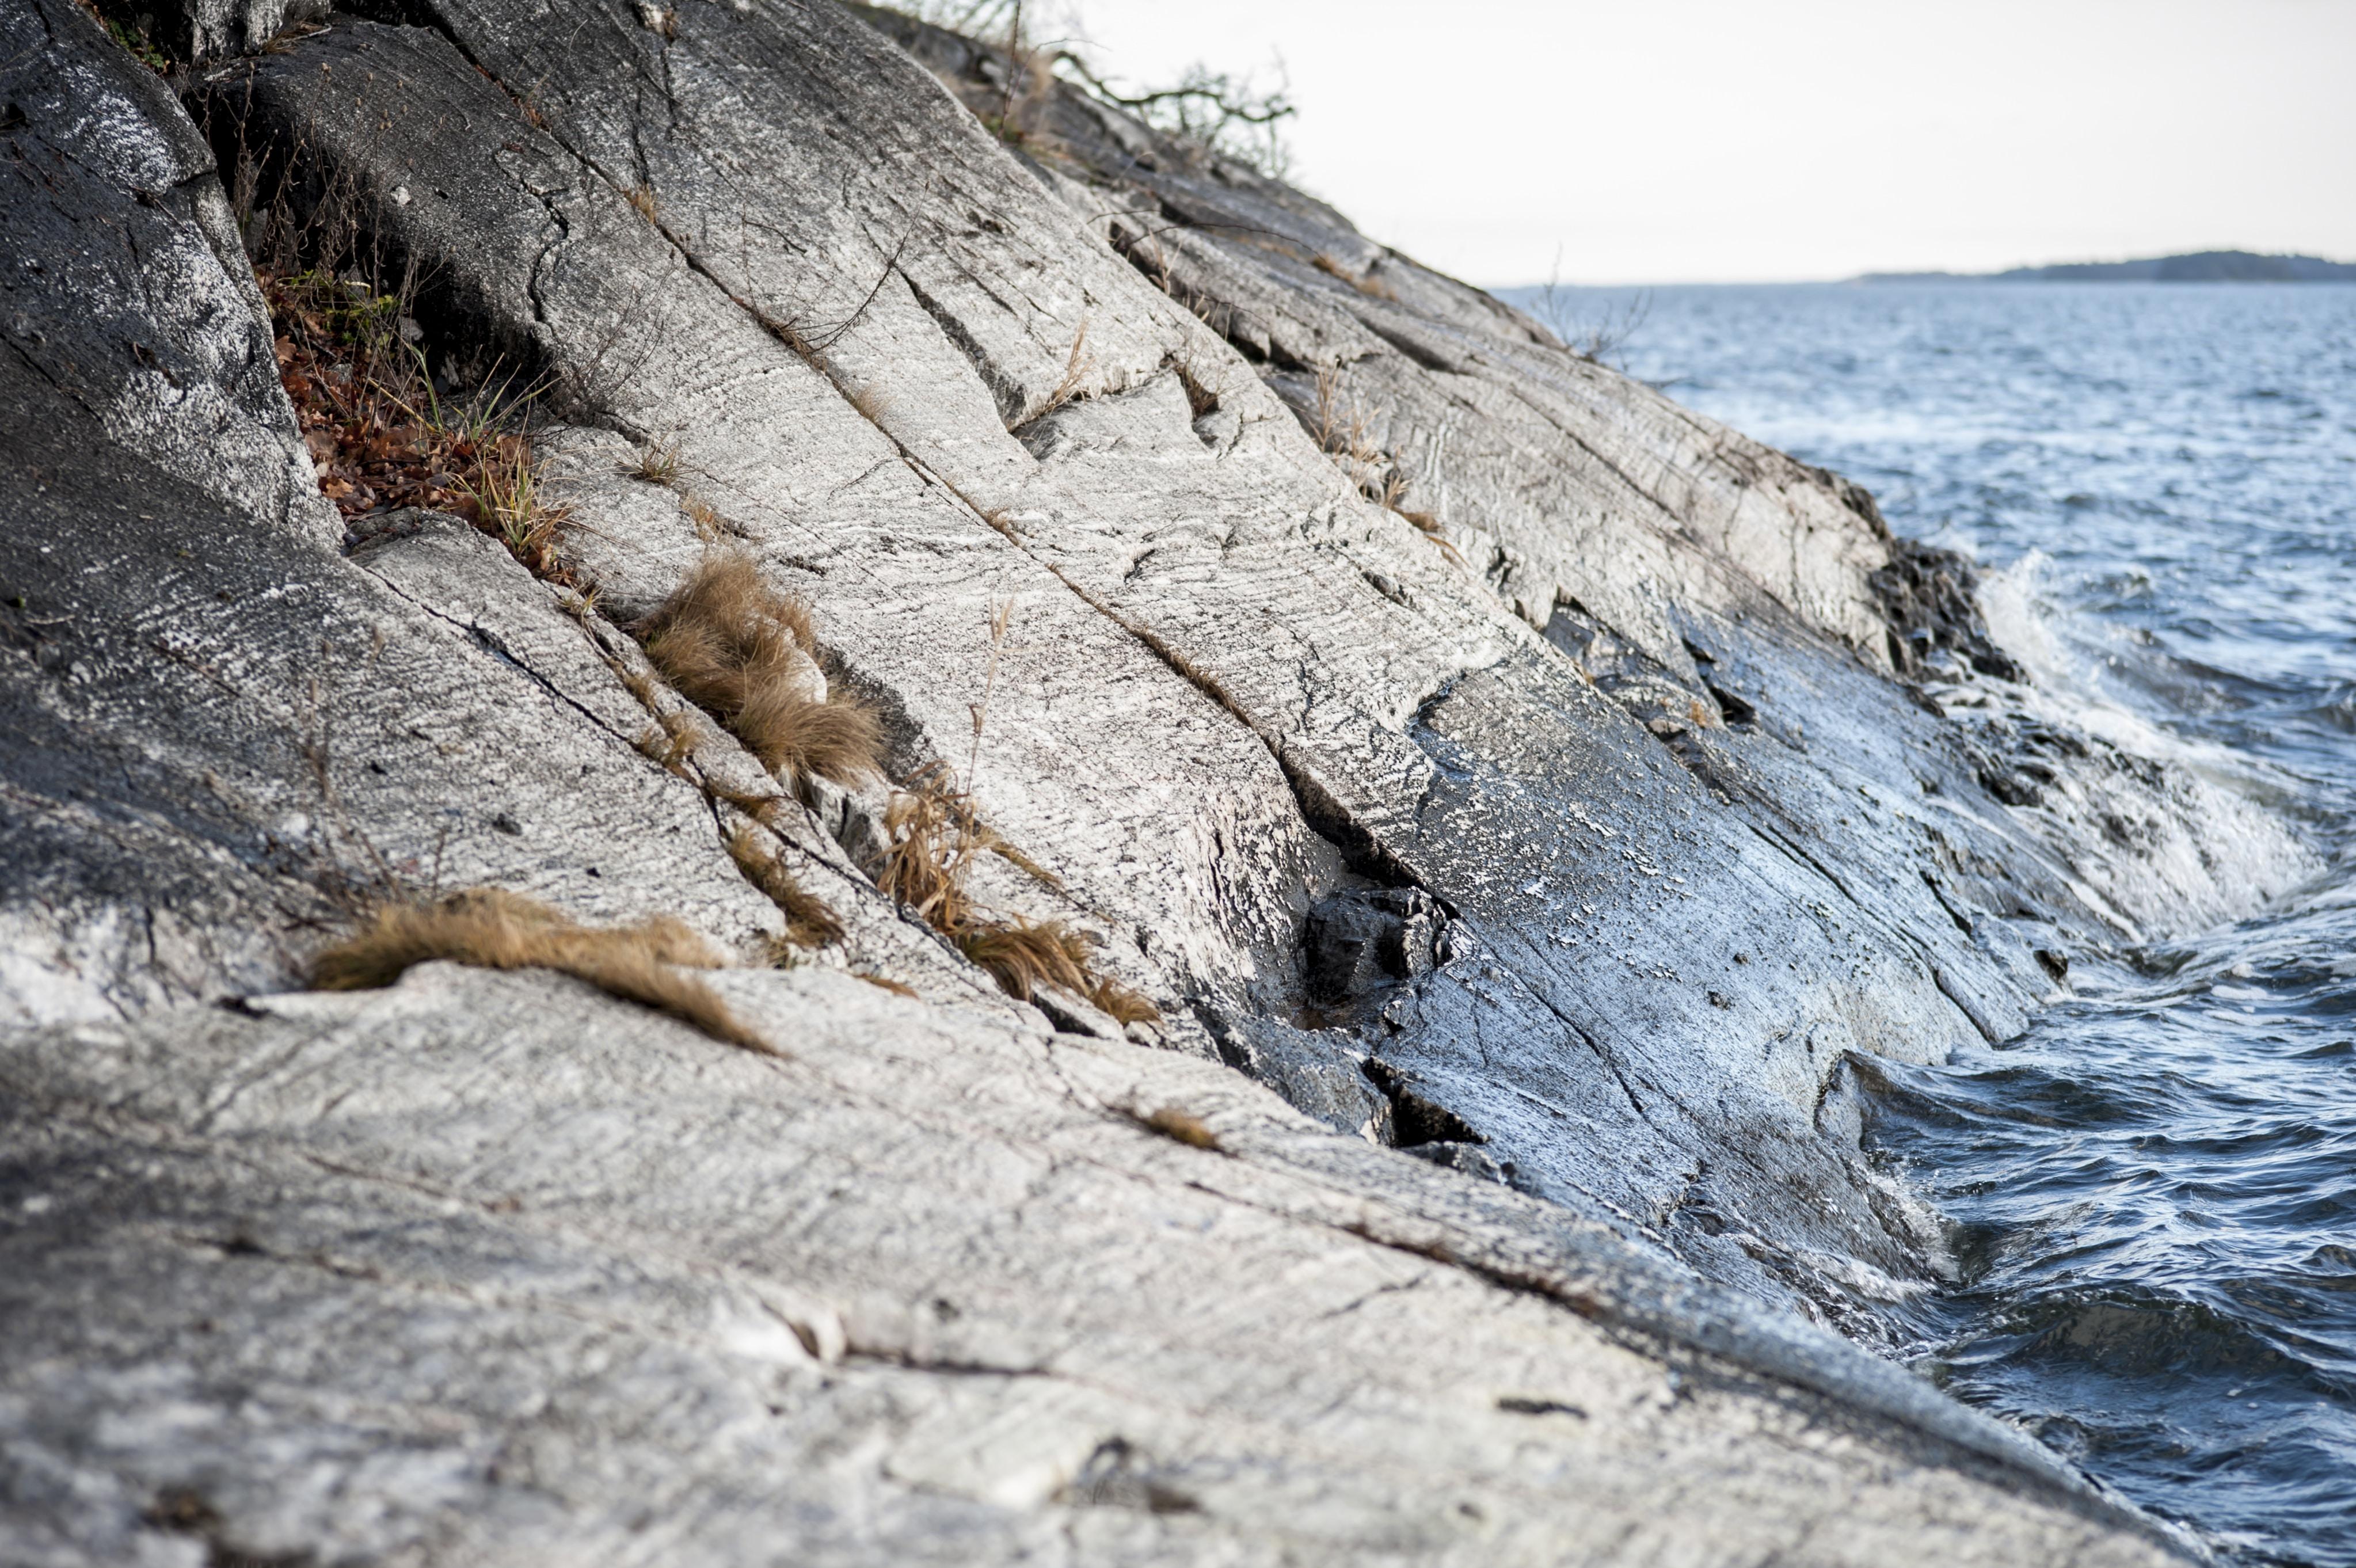 seashore near rocky mountain